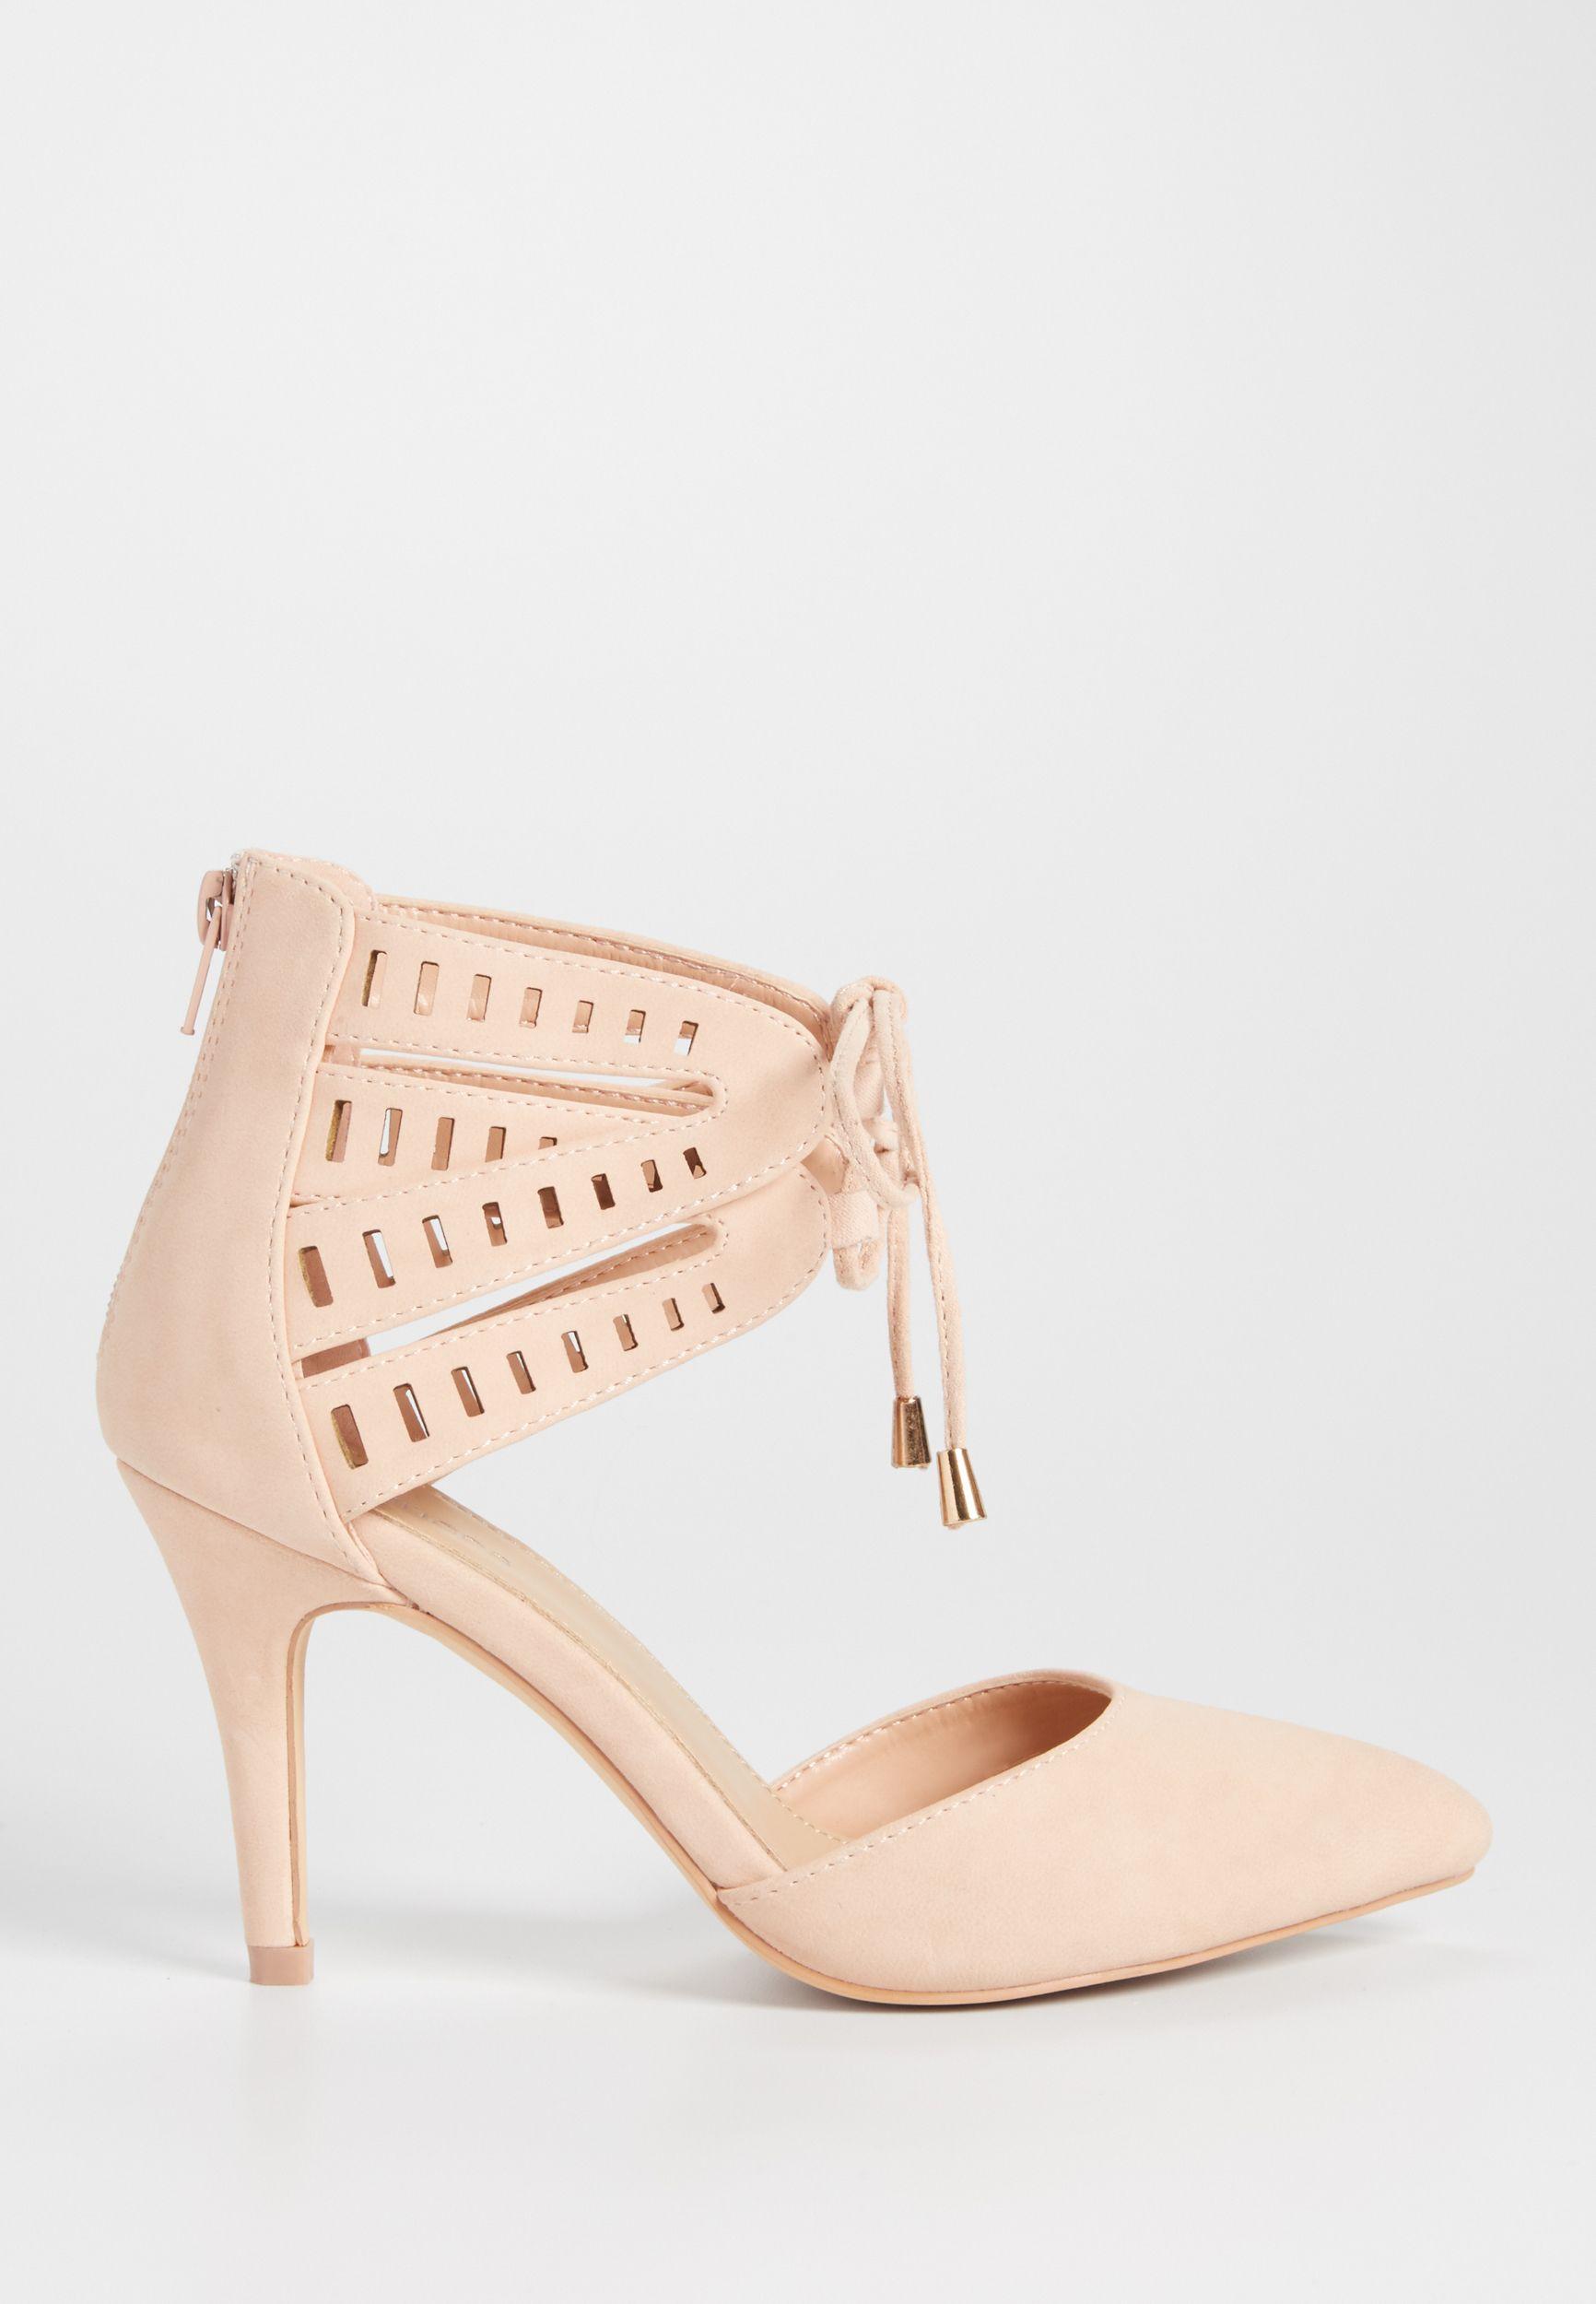 8a7b3f4fdc7b Cameron lace up laser cut heel in blush (original price